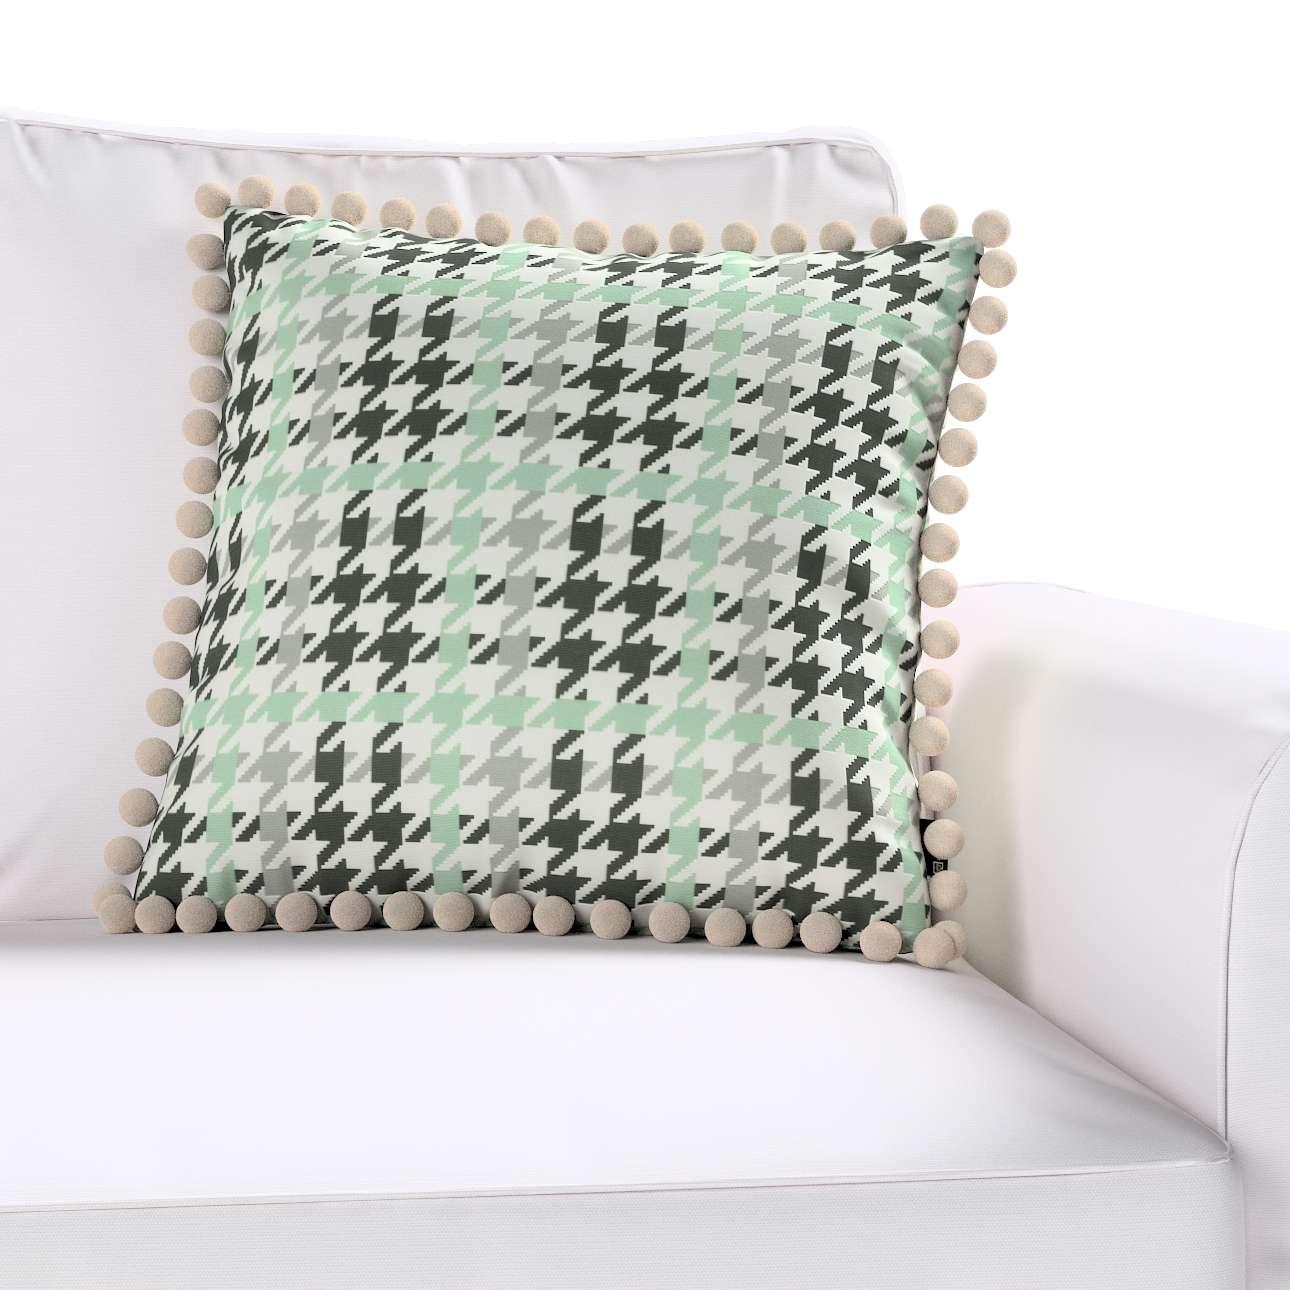 Poszewka Wera na poduszkę w kolekcji Brooklyn, tkanina: 137-77